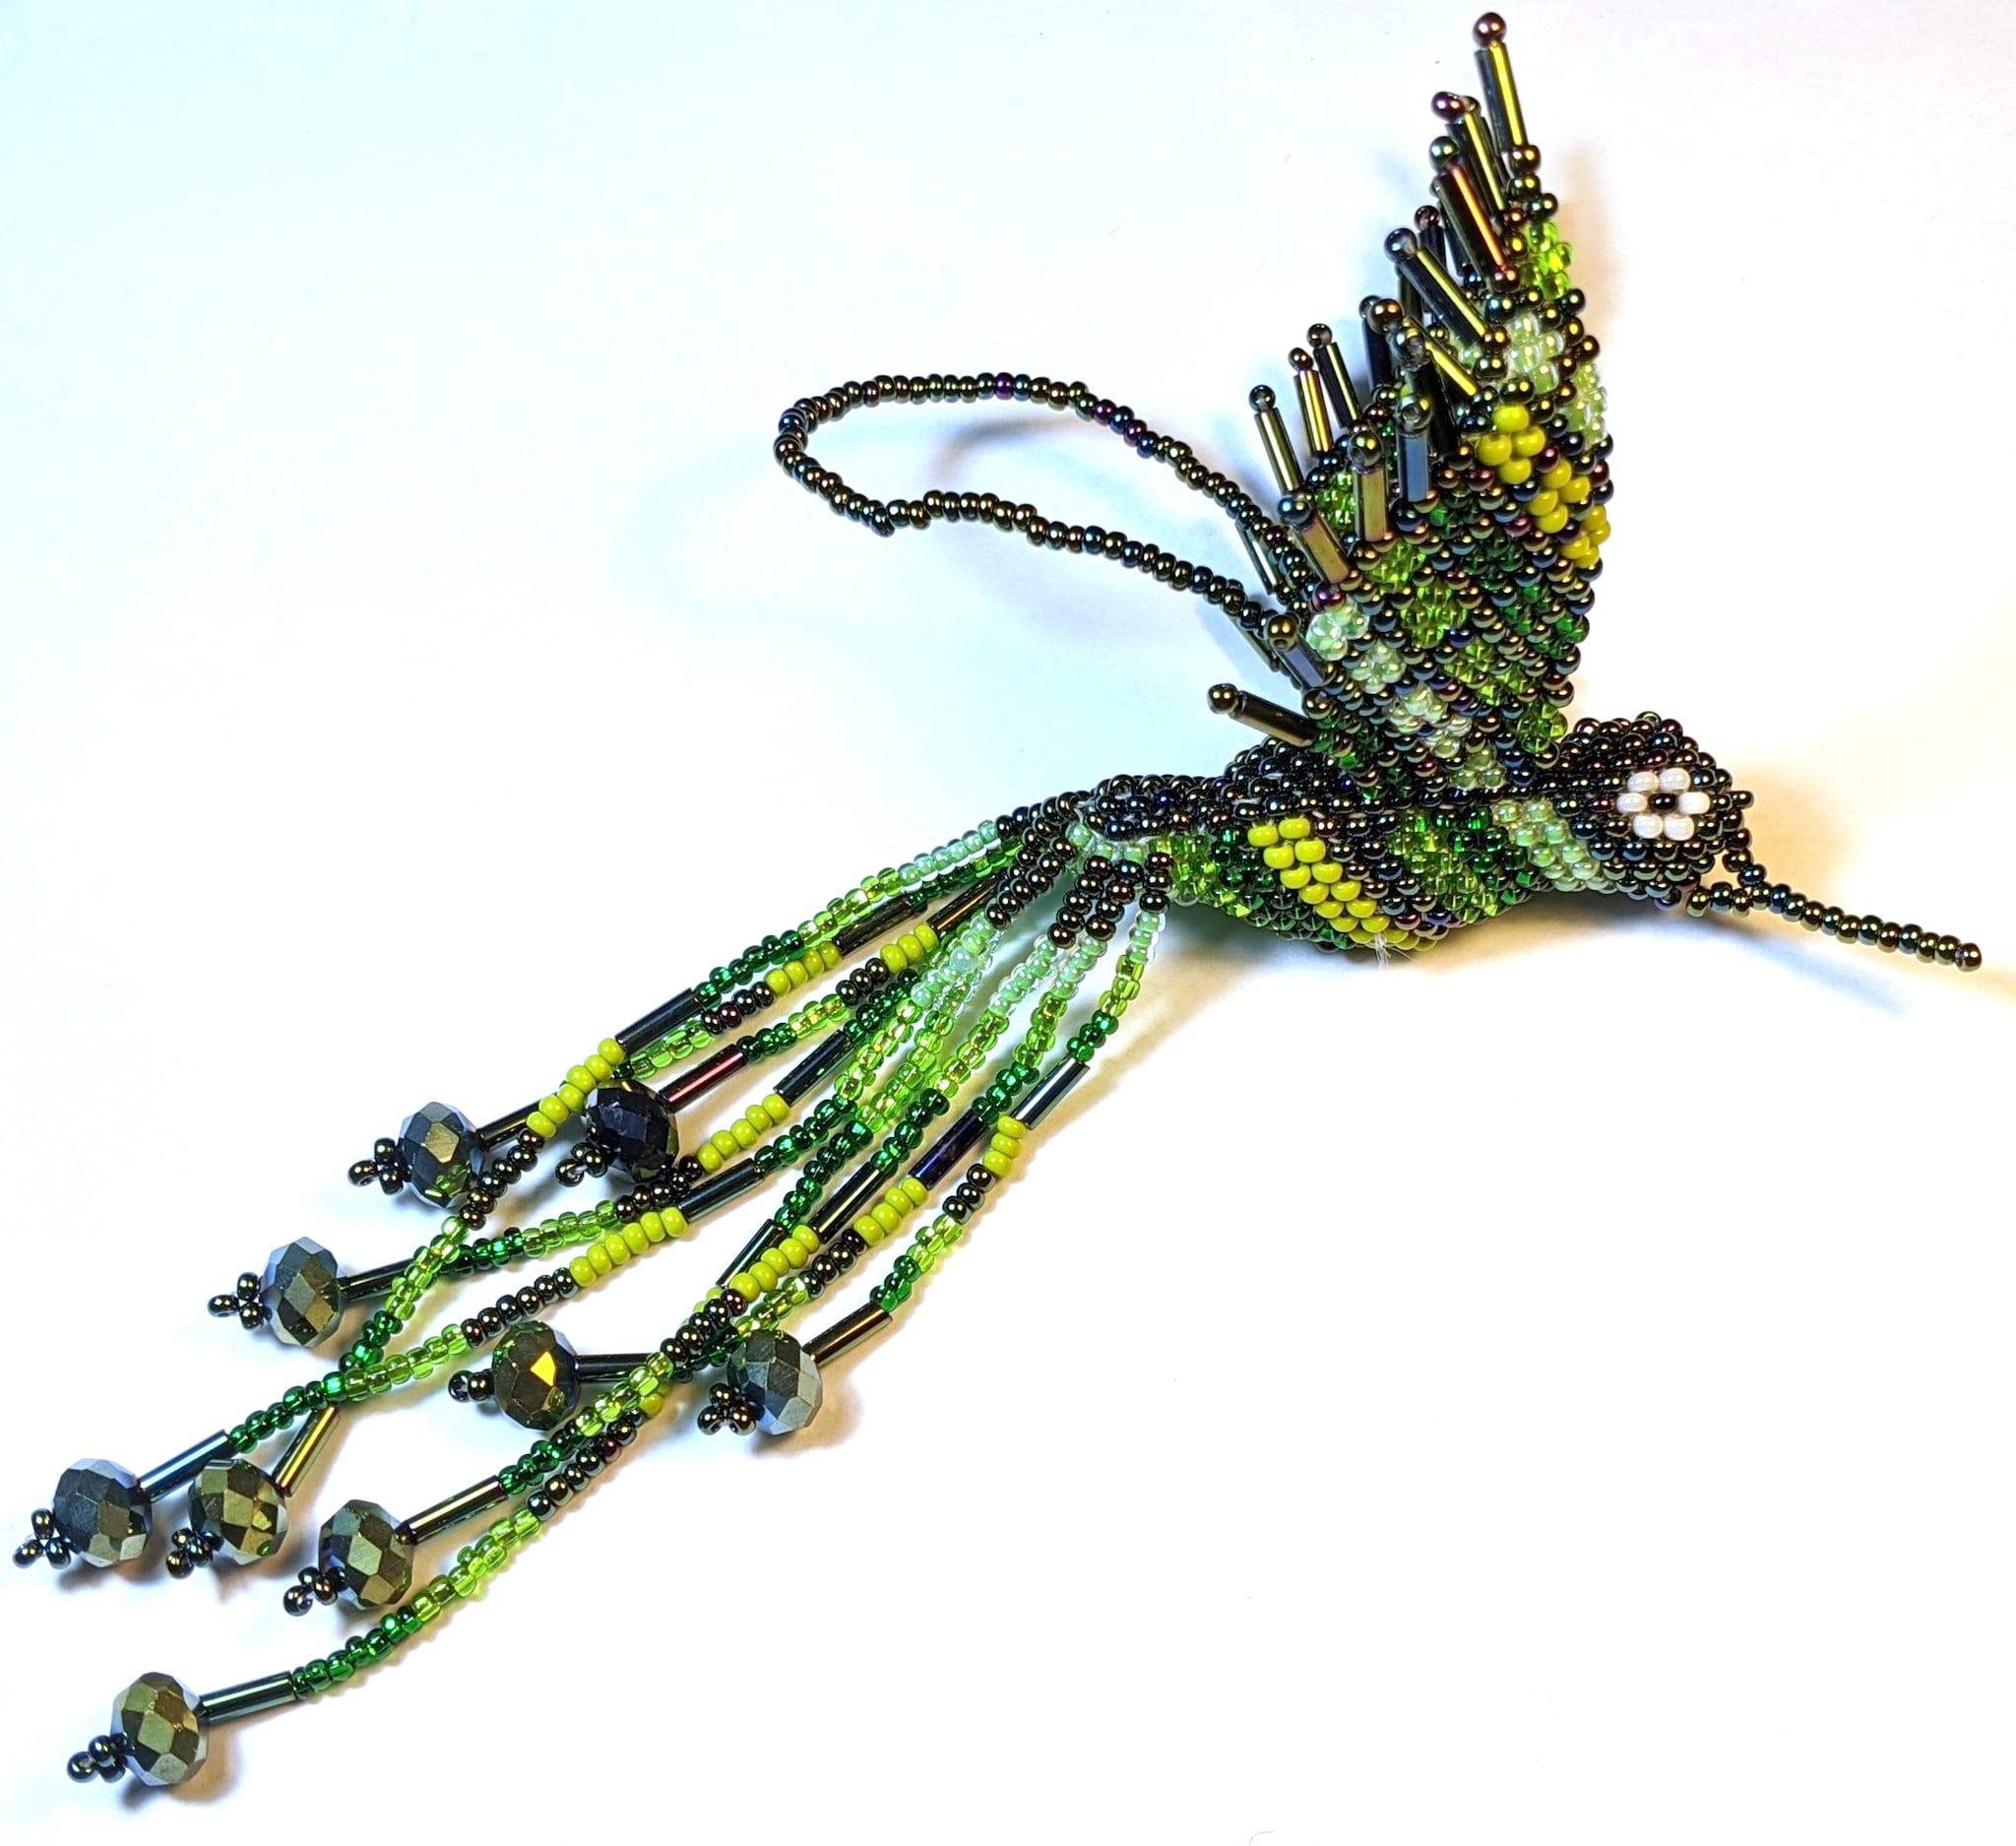 Hummingbird Beaded Ornament - Greens and Iridescent Green